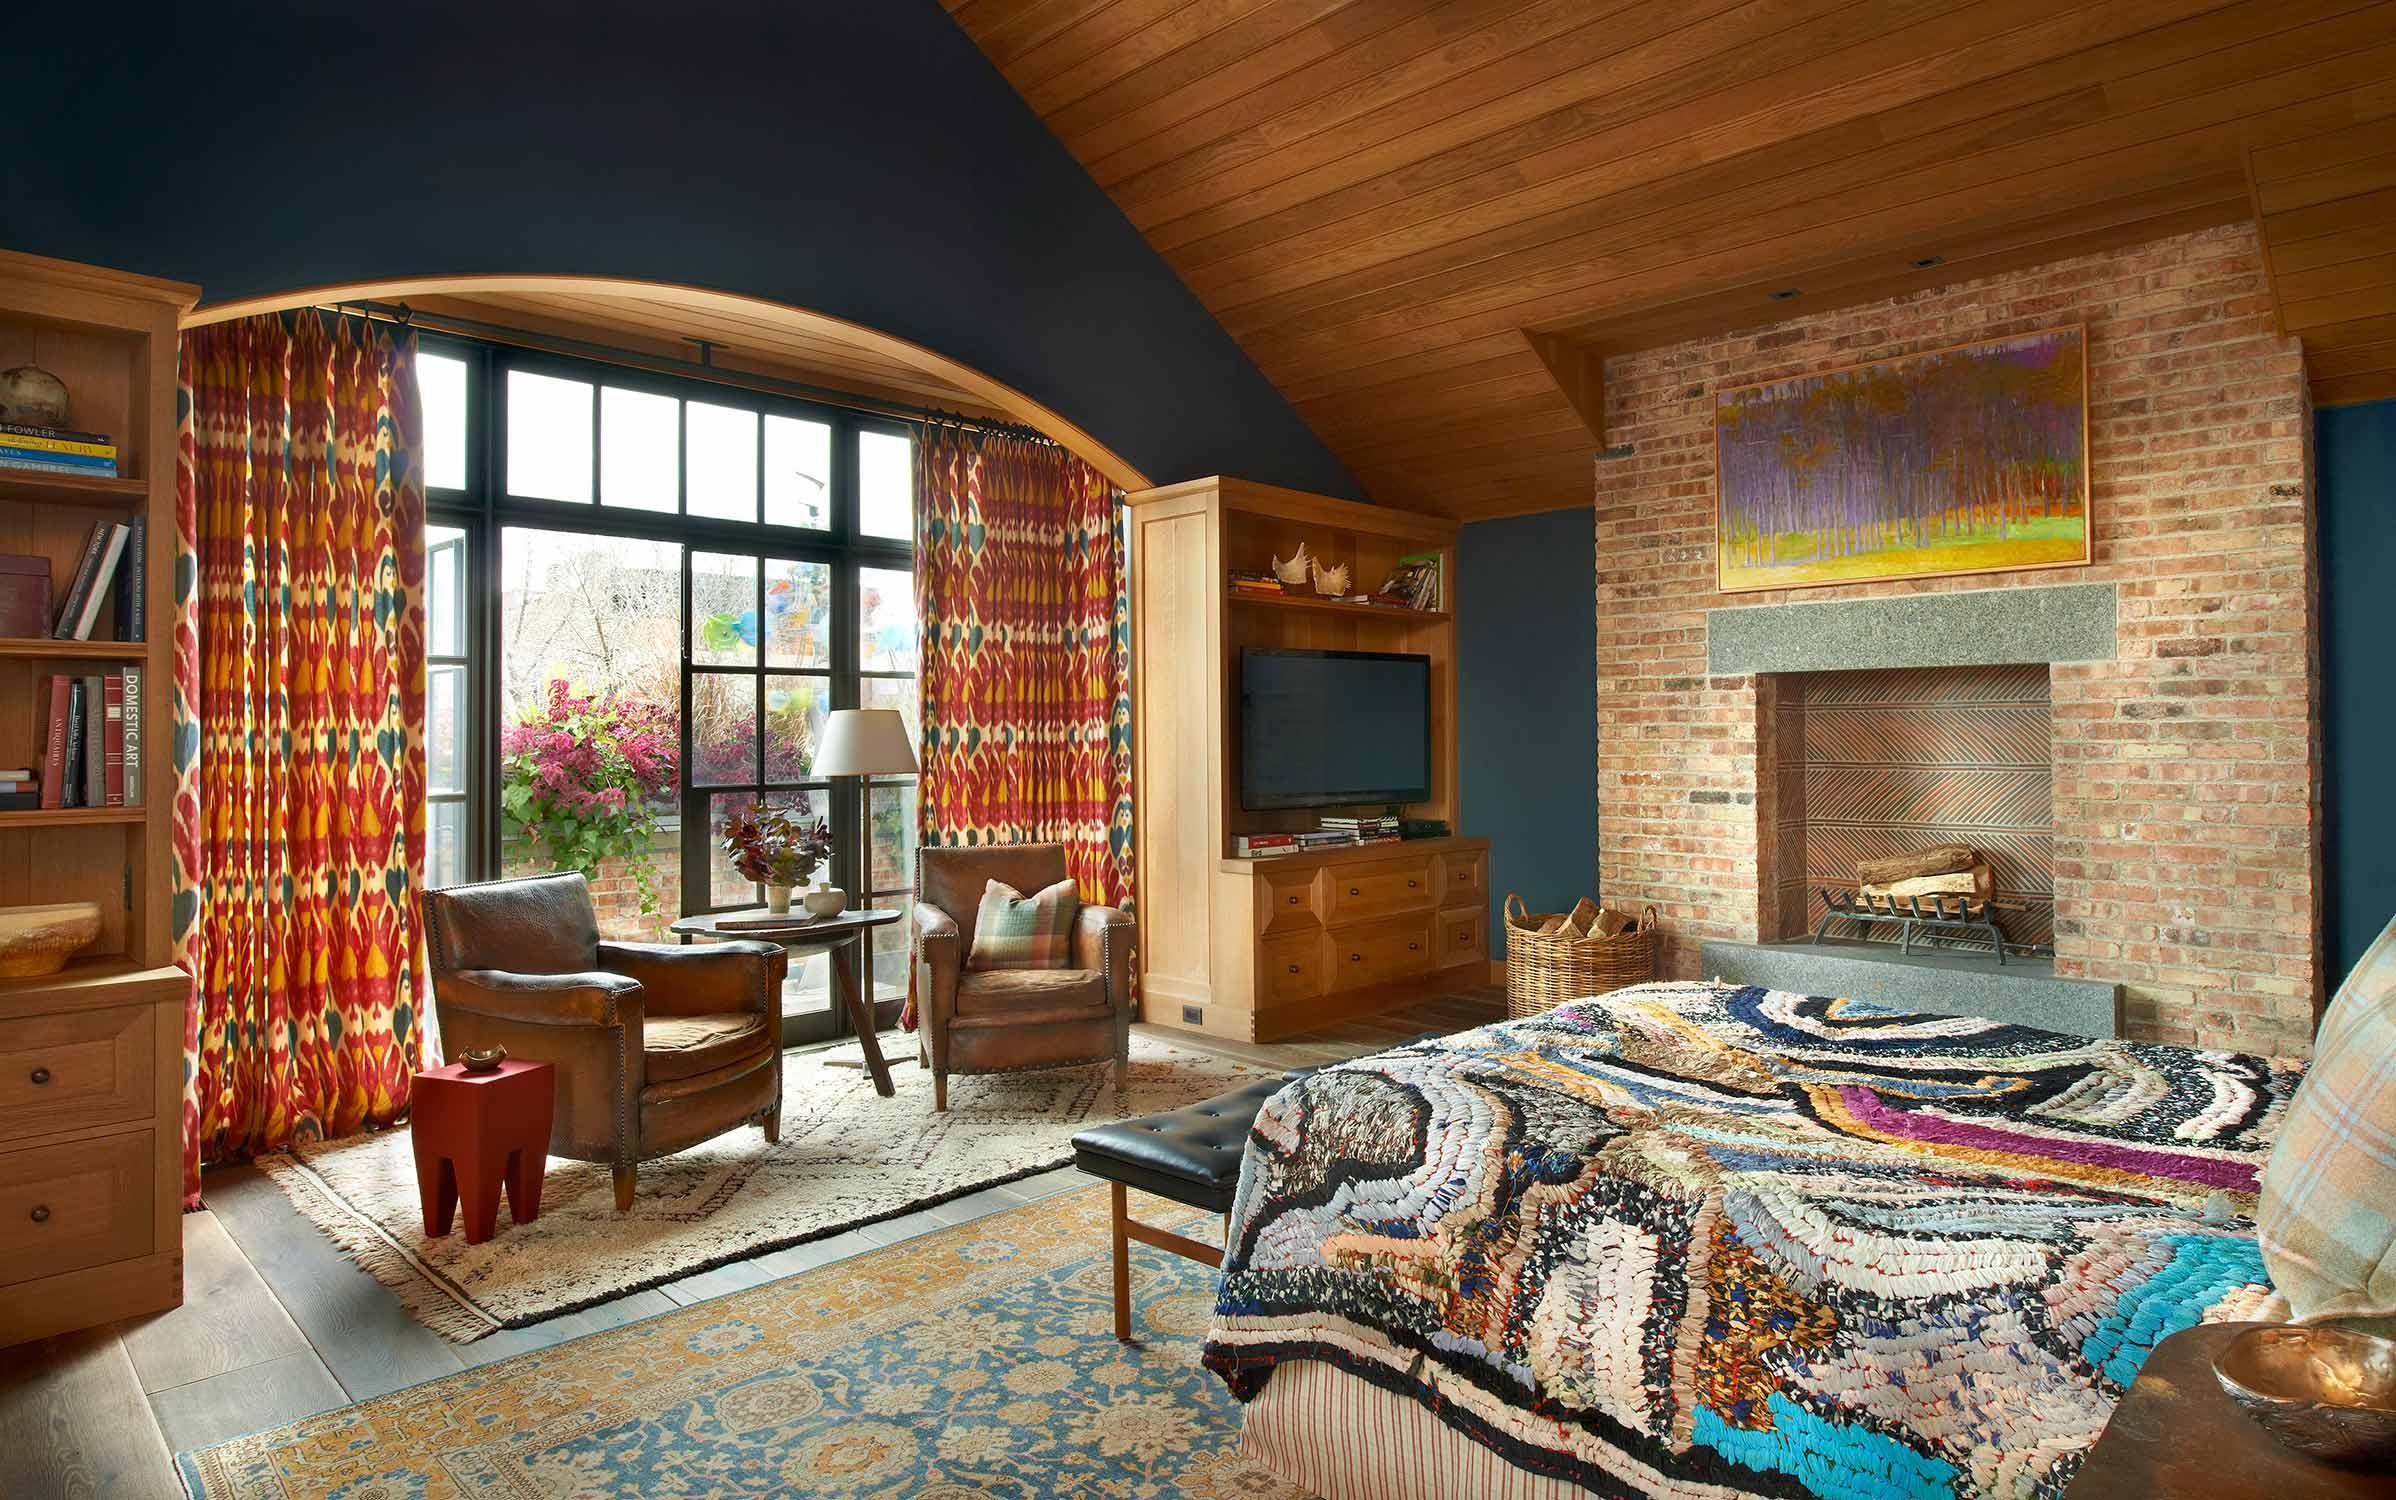 window treatments, bedding, shams & upholstery  Interior Design: Bruce Fox, Inc.